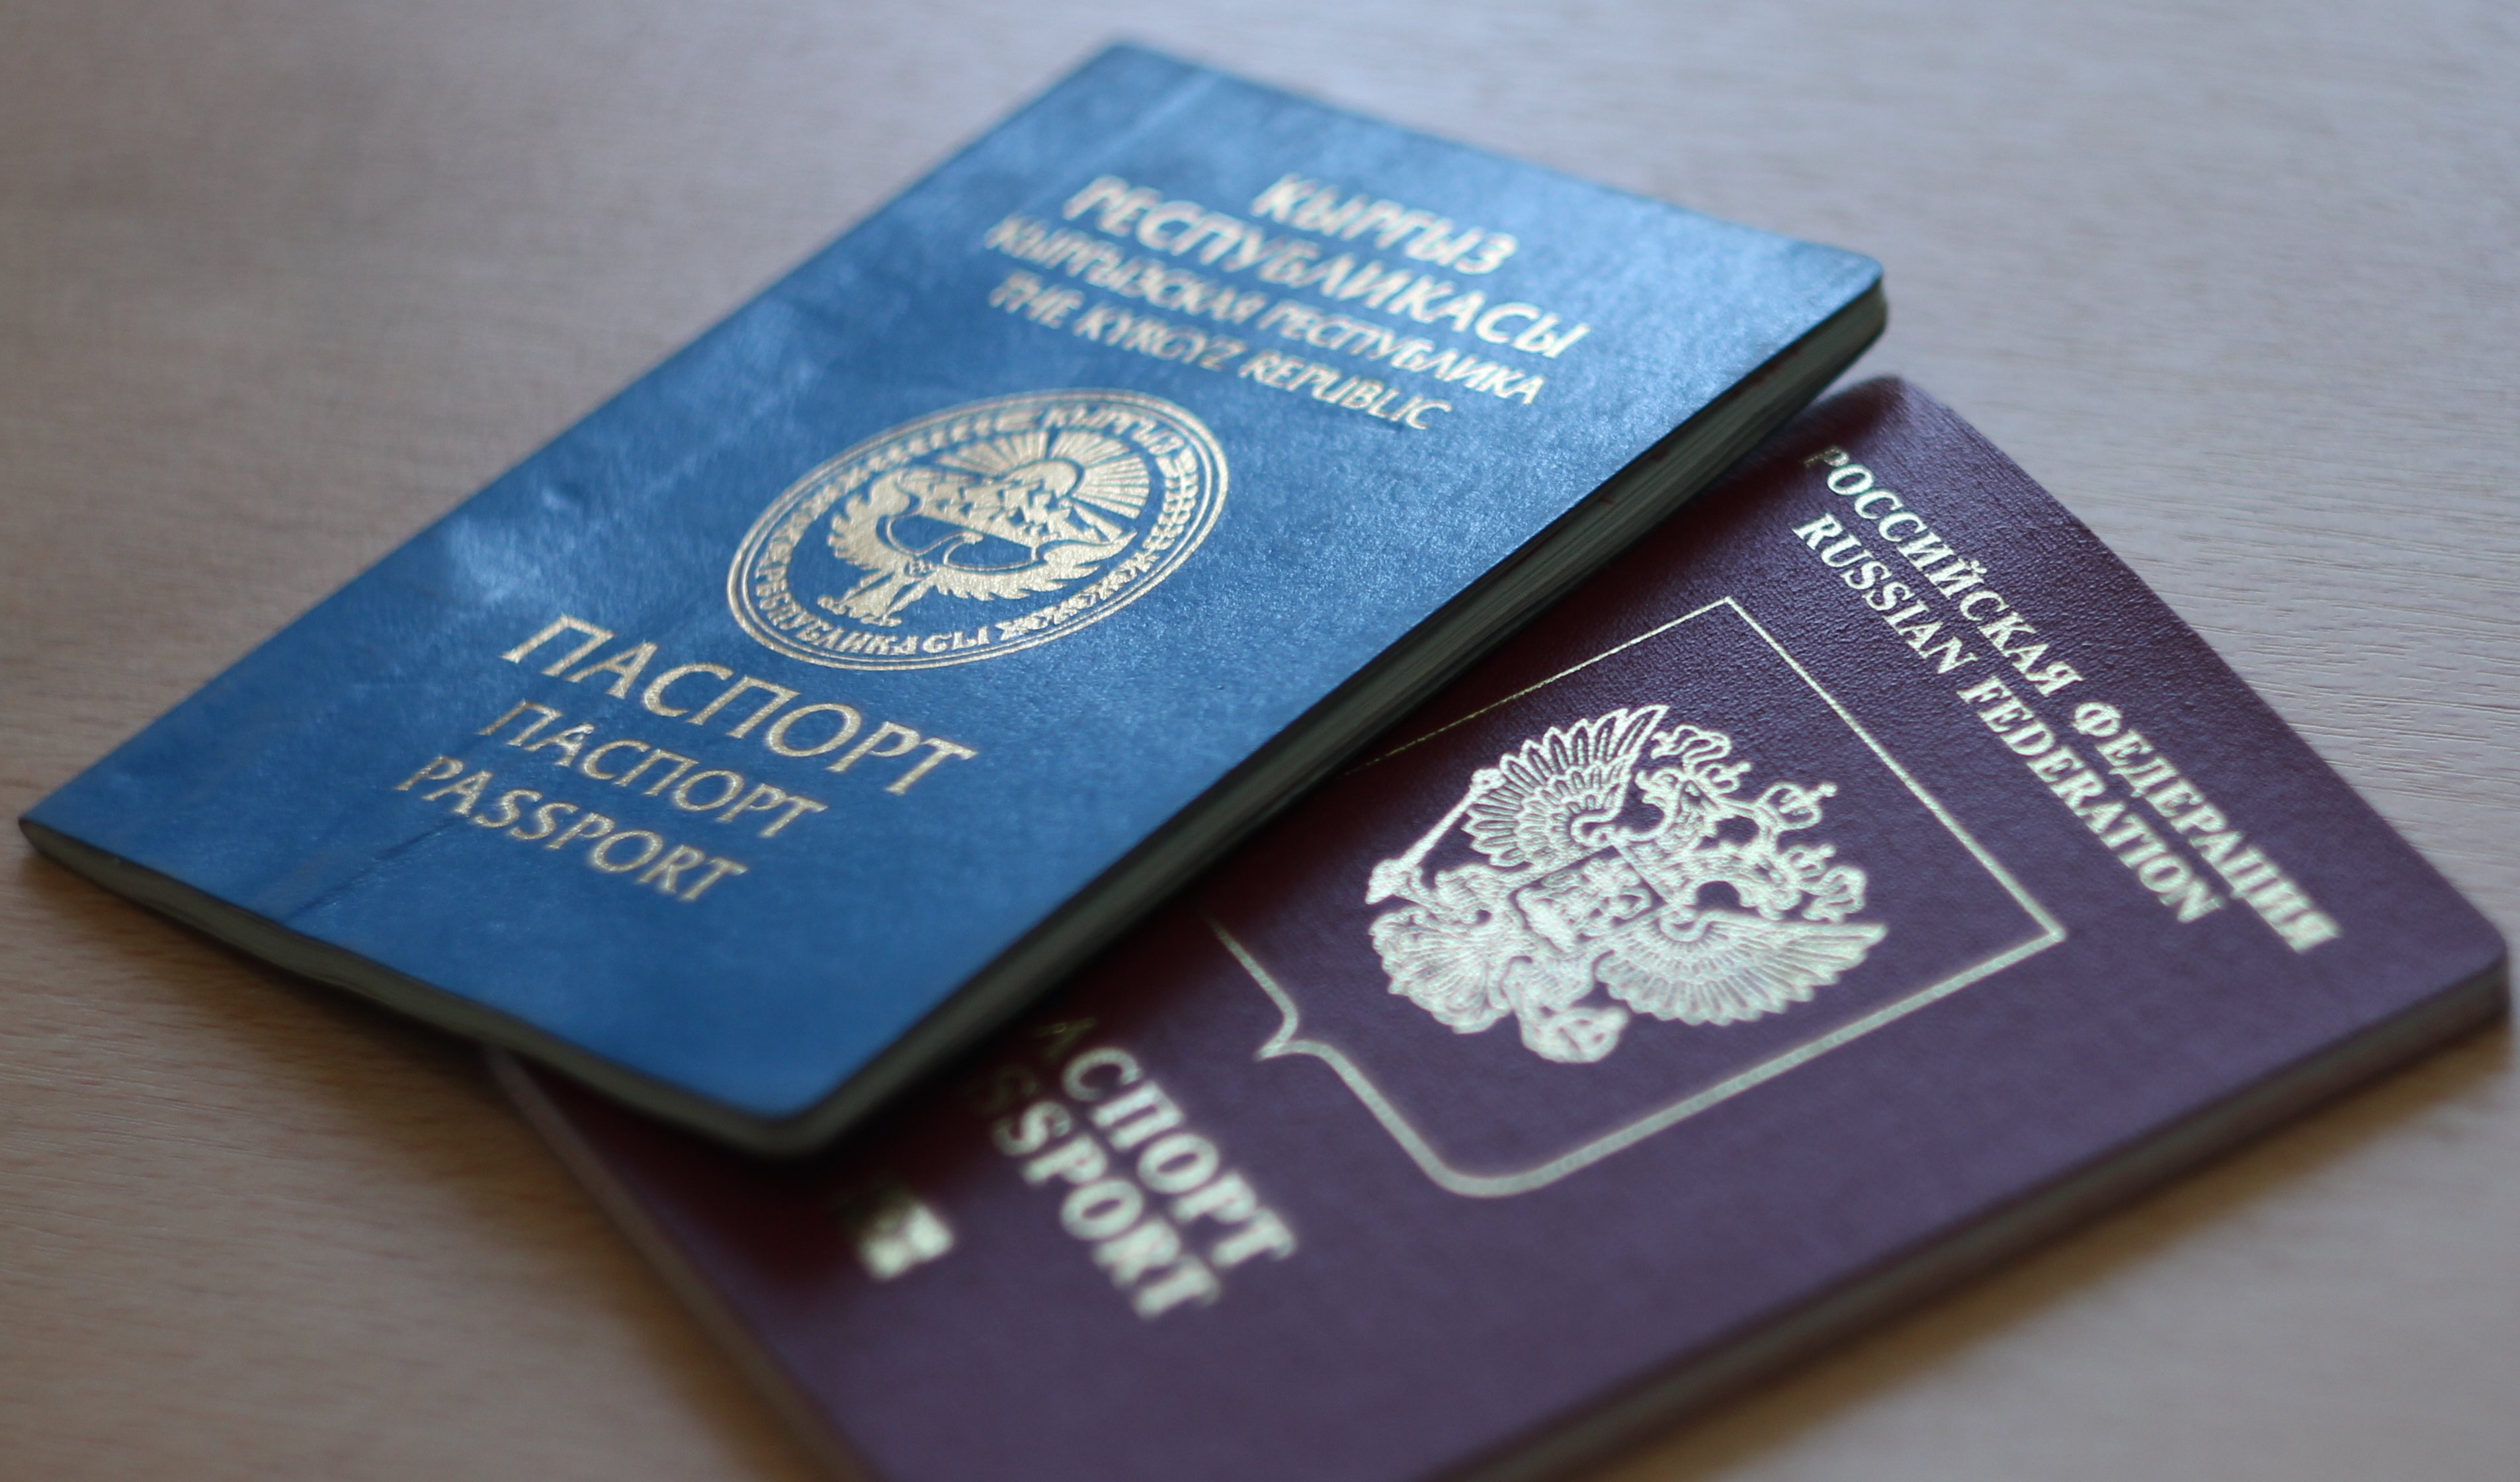 фото на гражданство рф требования